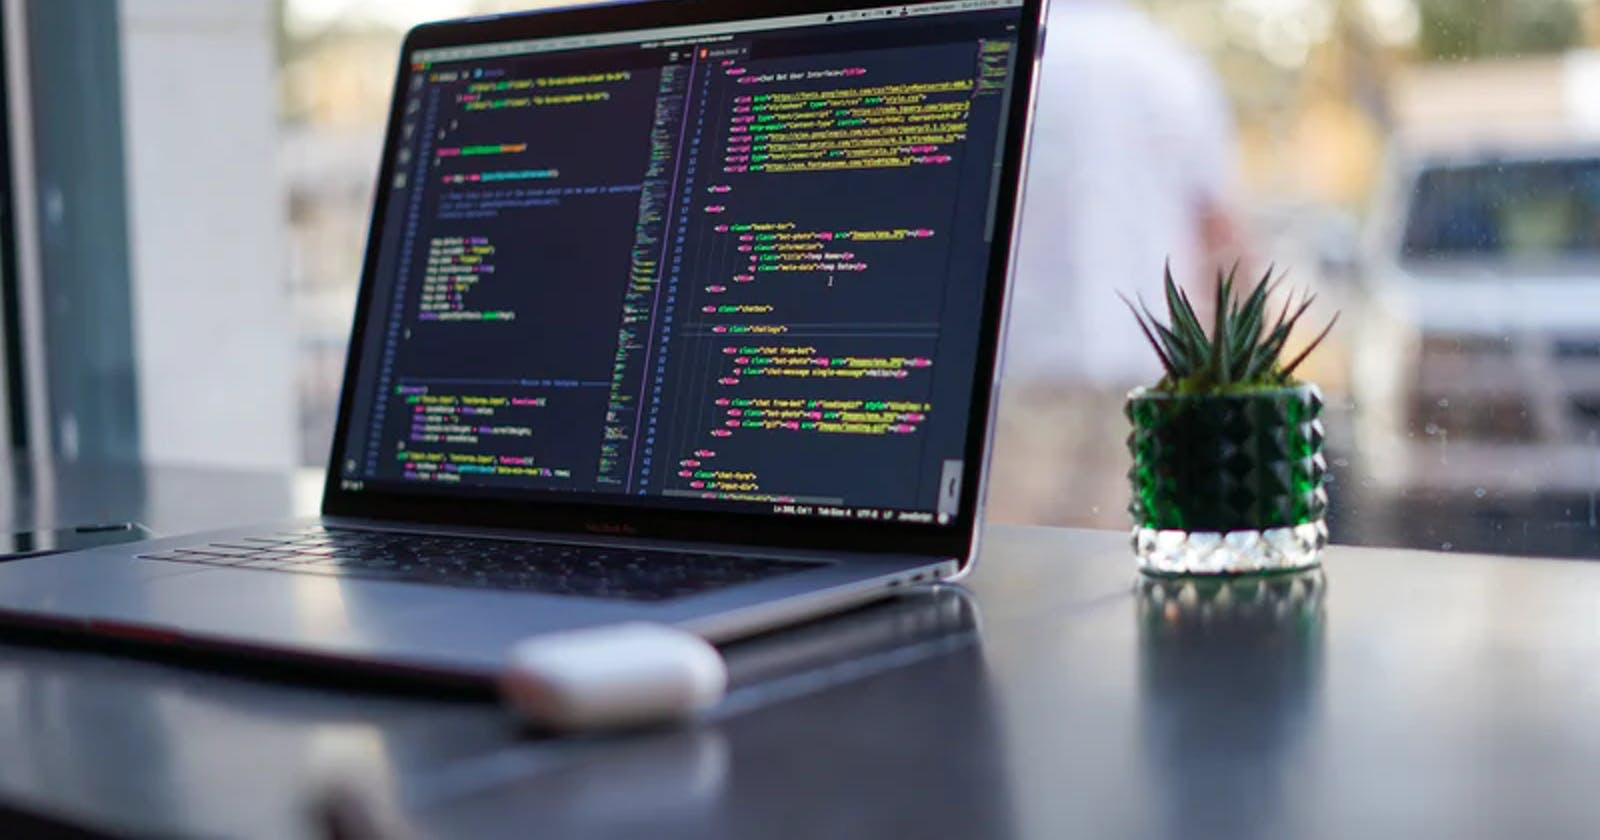 my life before code